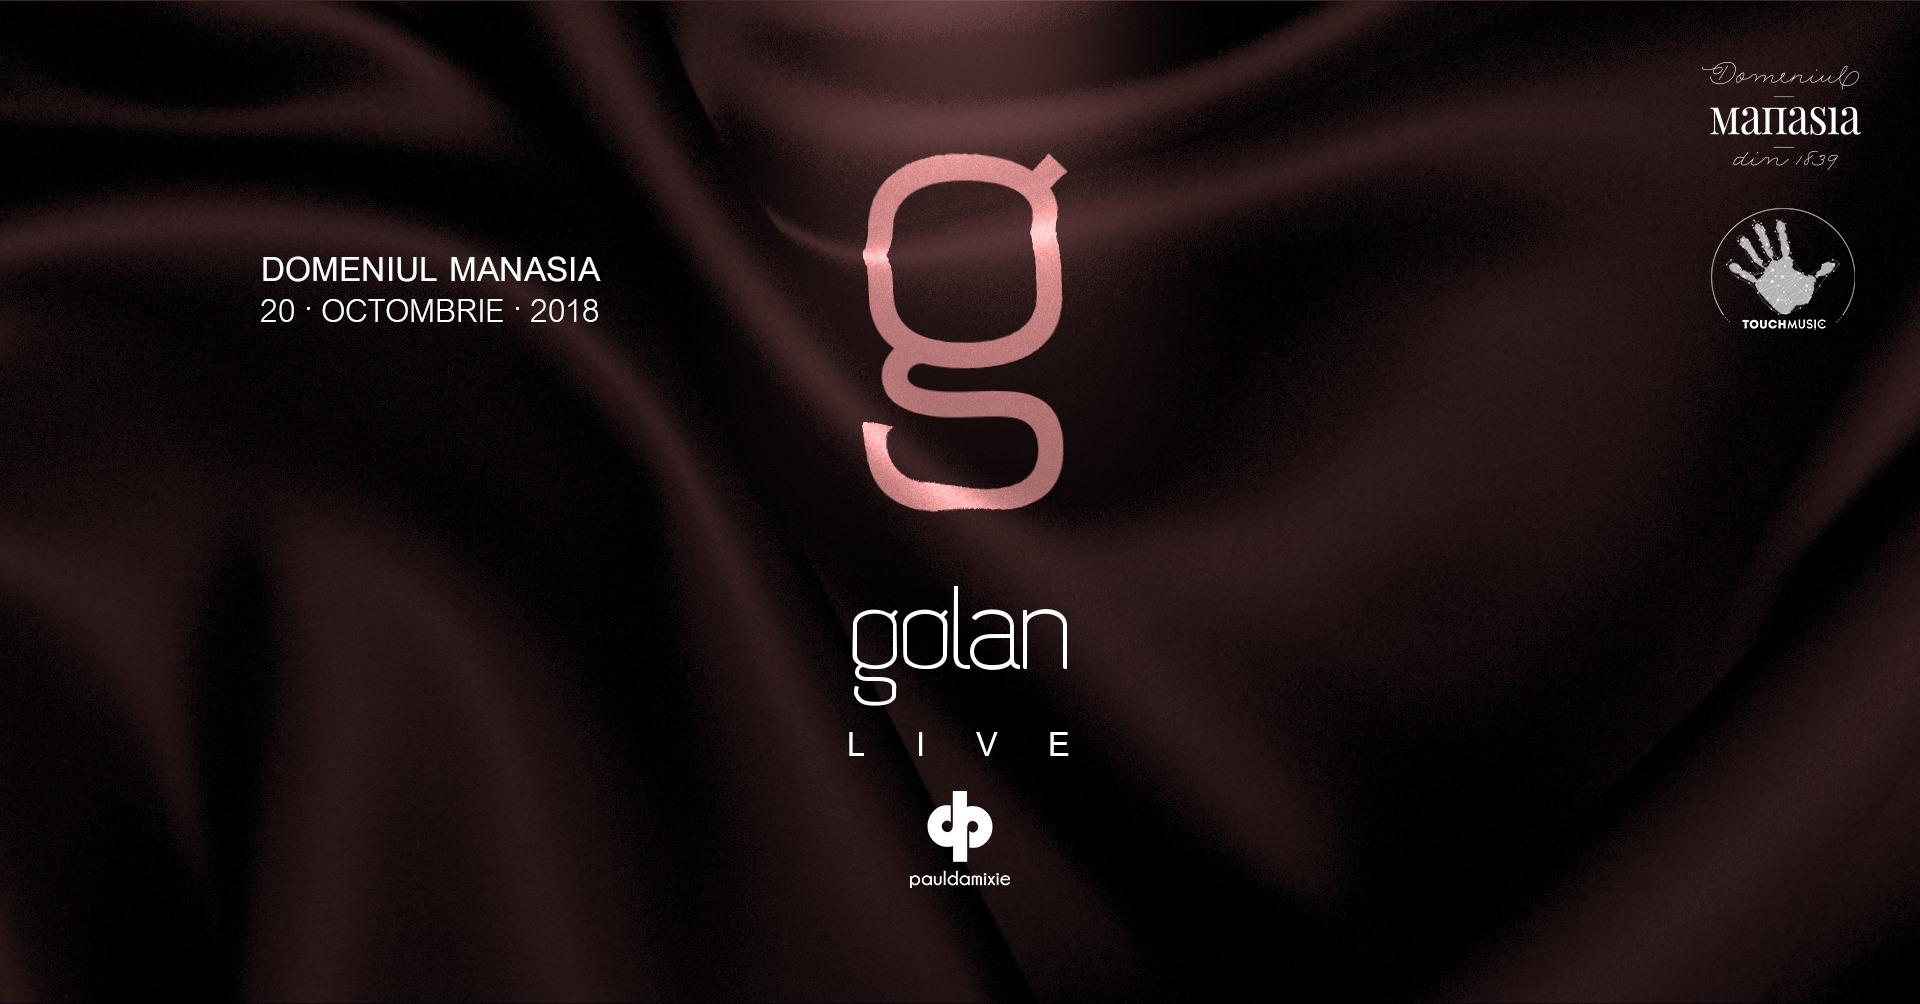 Golan Live la domeniul Manasia